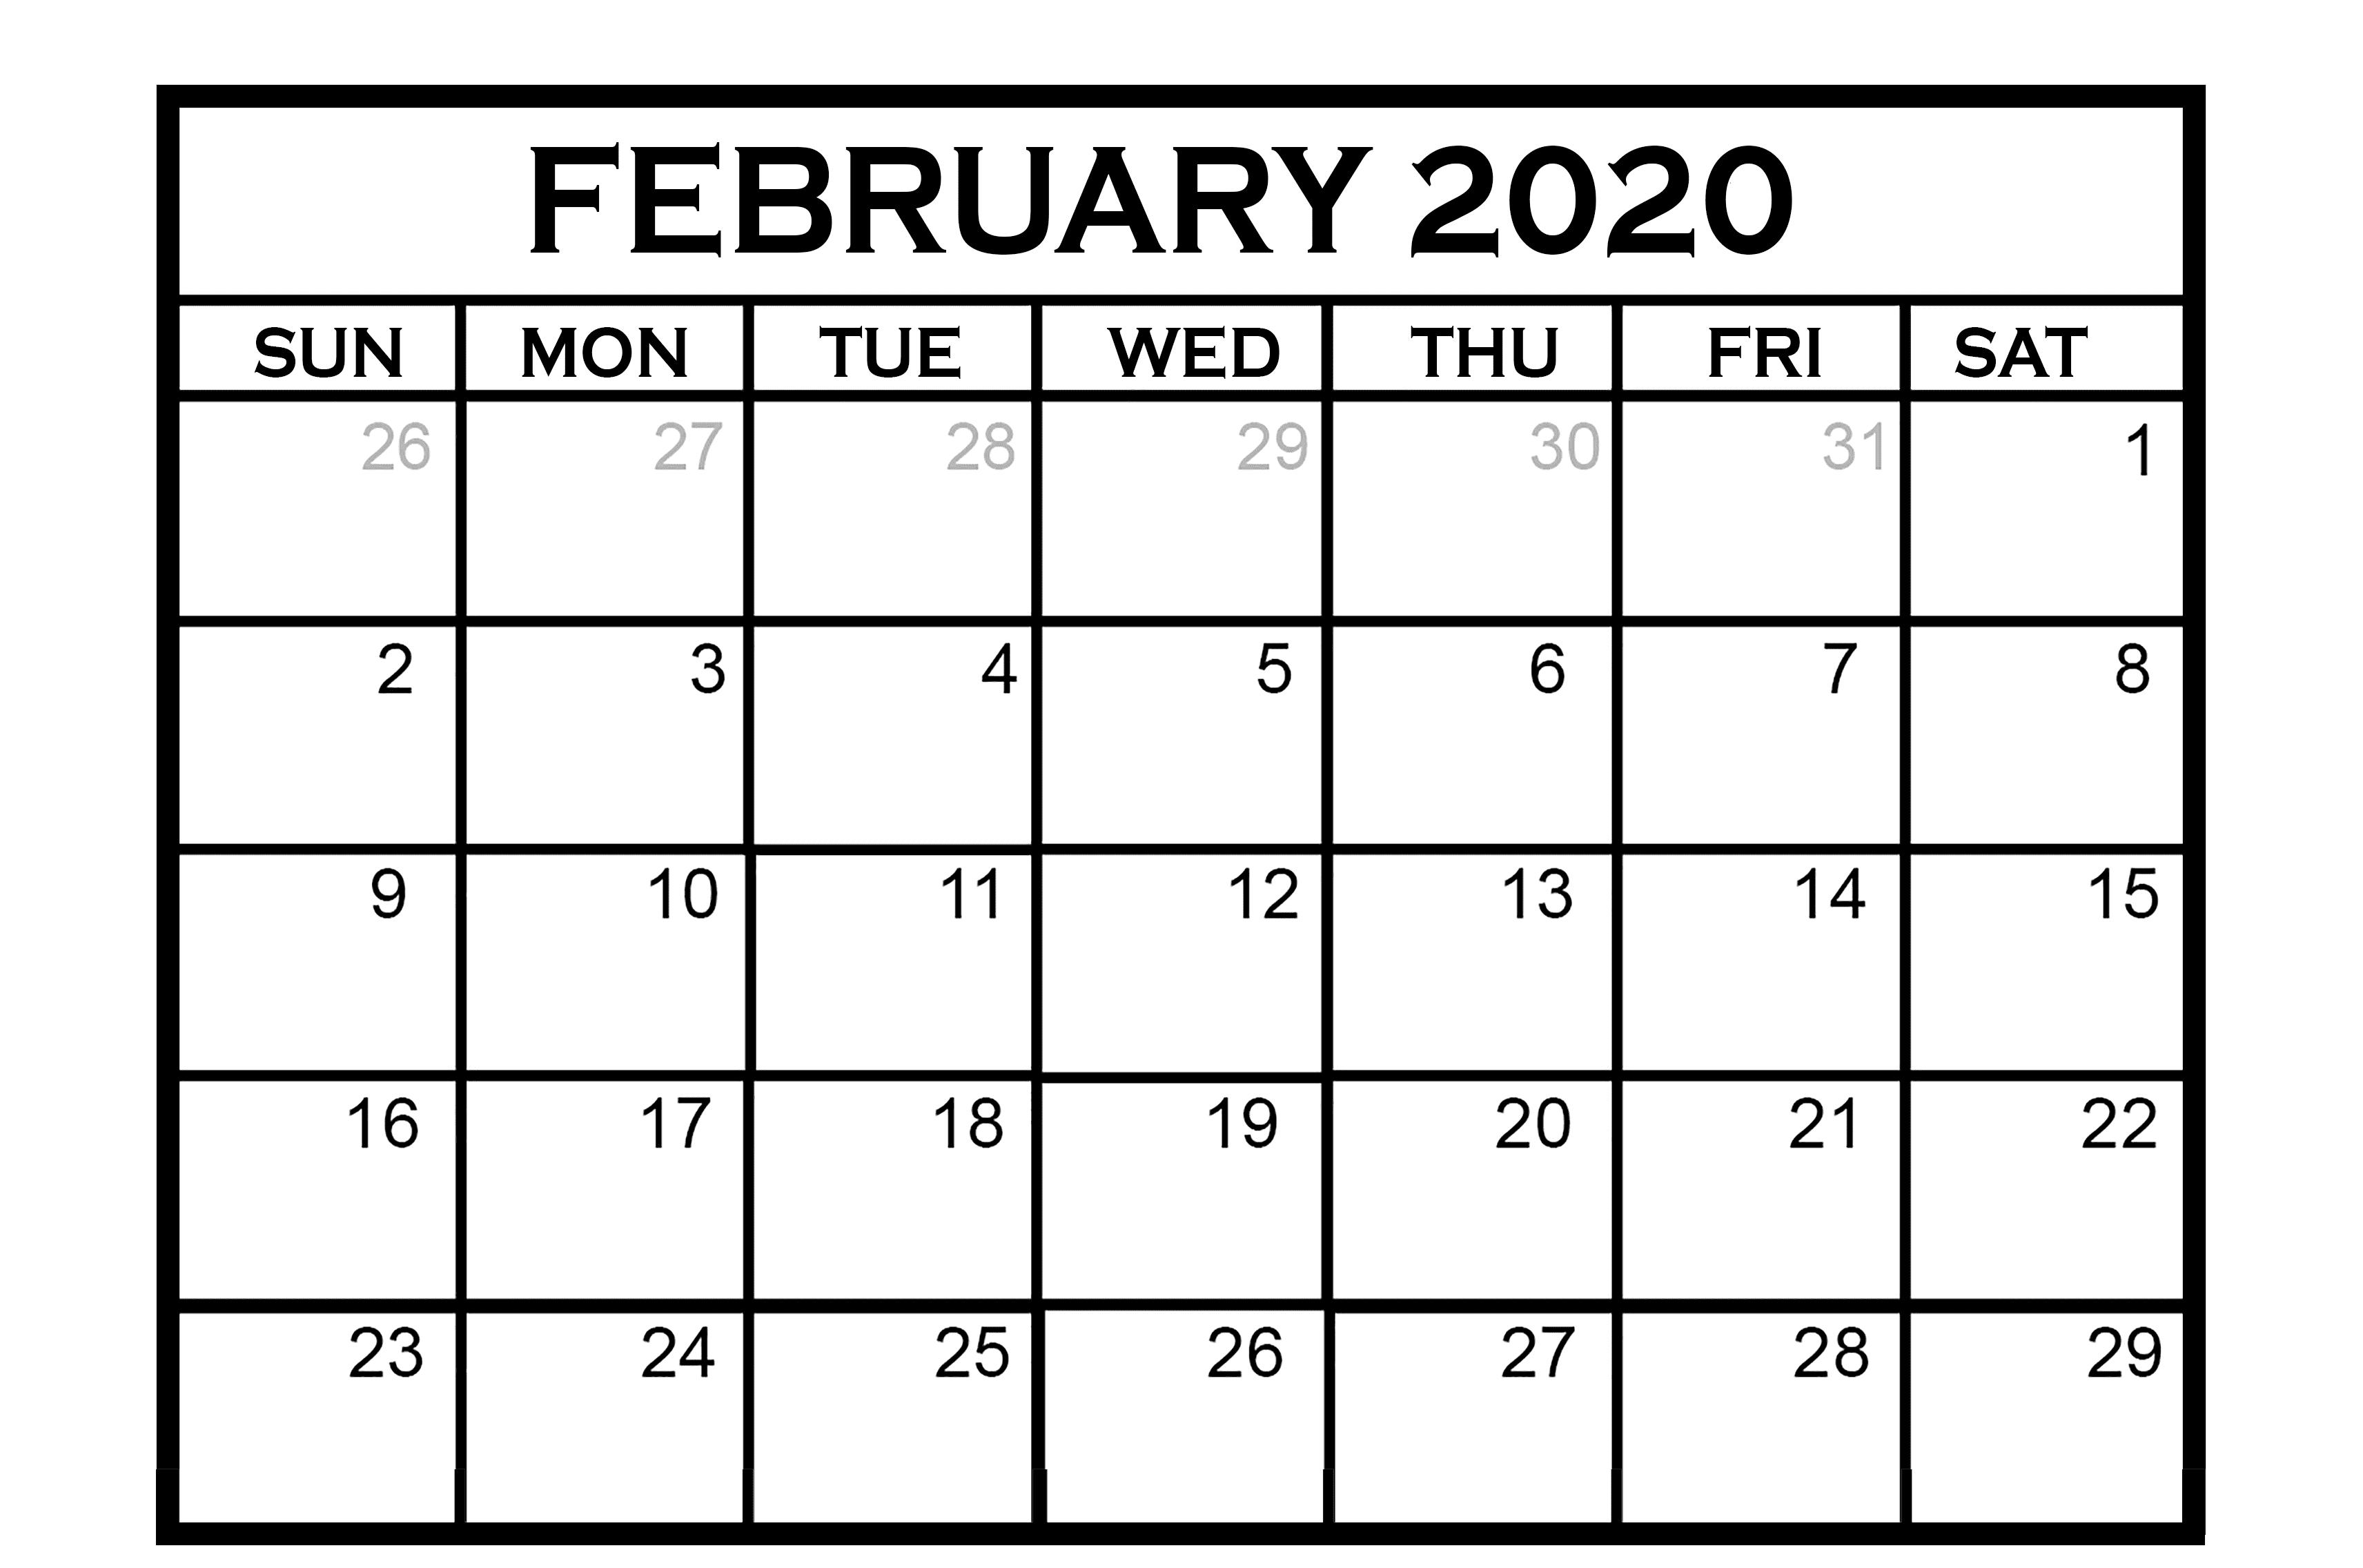 February 2020 Calendar Us Holidays, Events List | Free within Feb 2020 Calendar